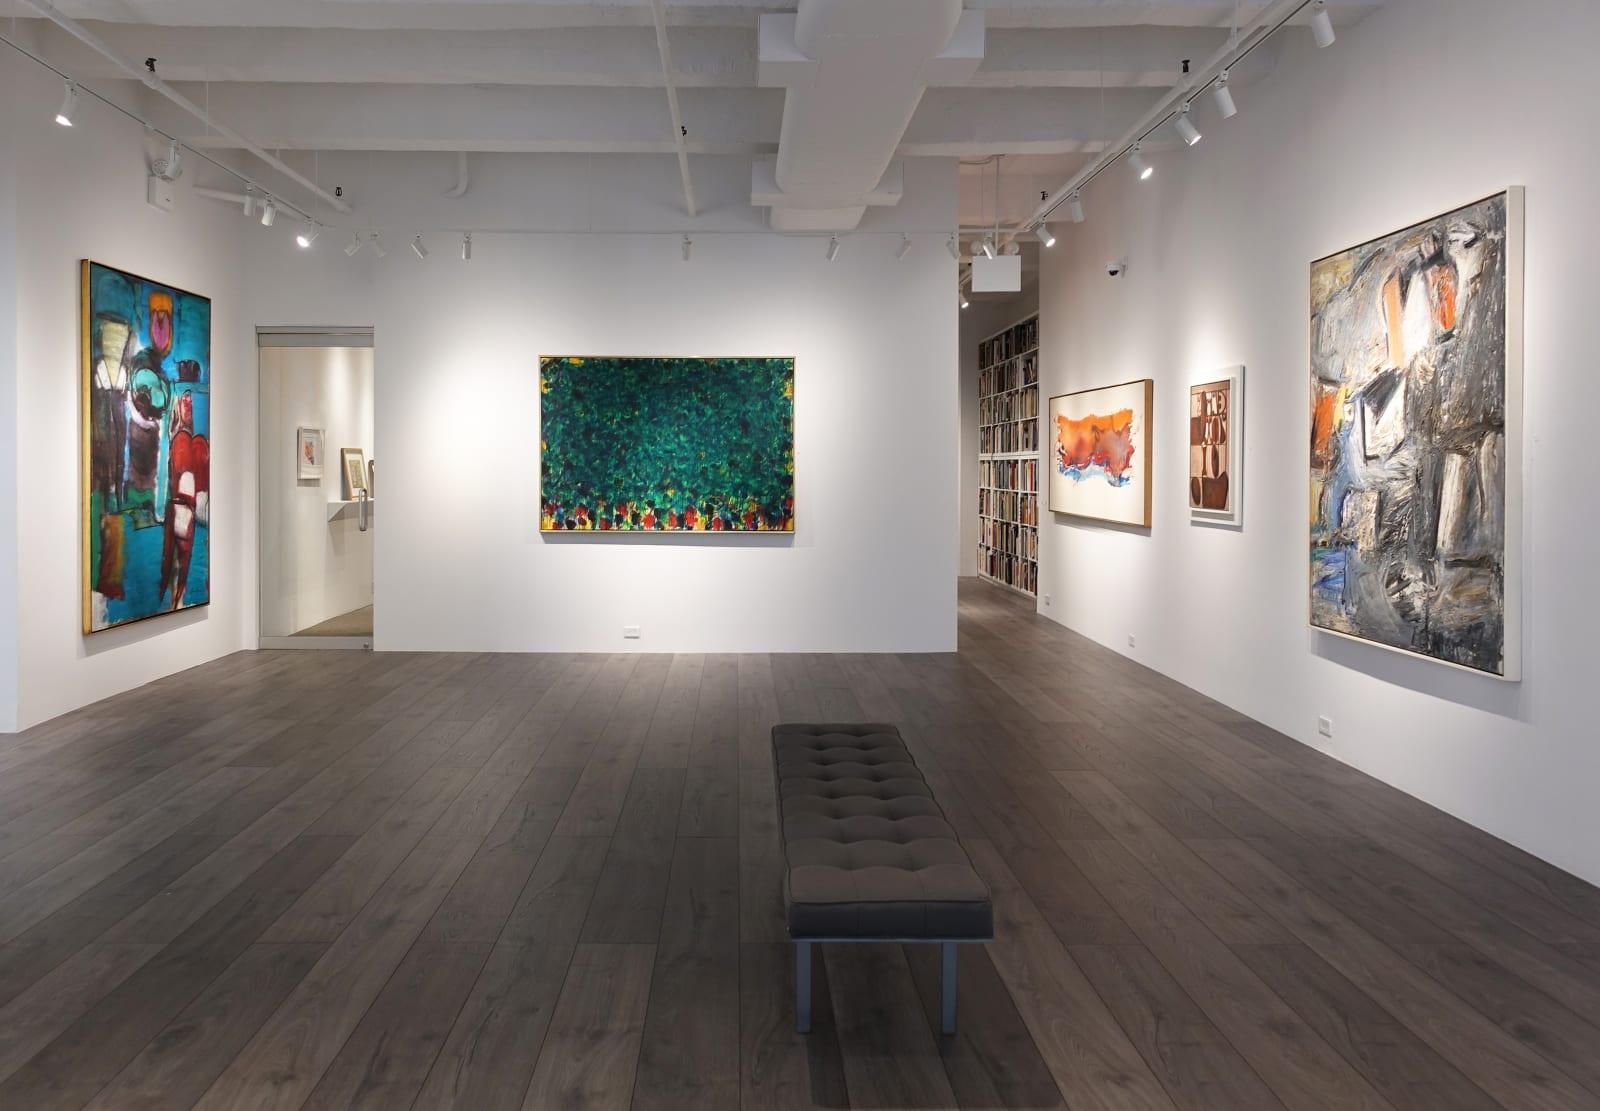 Hollis Taggart, 521 West 26th Street, 1st Floor, New York, NY (2018)